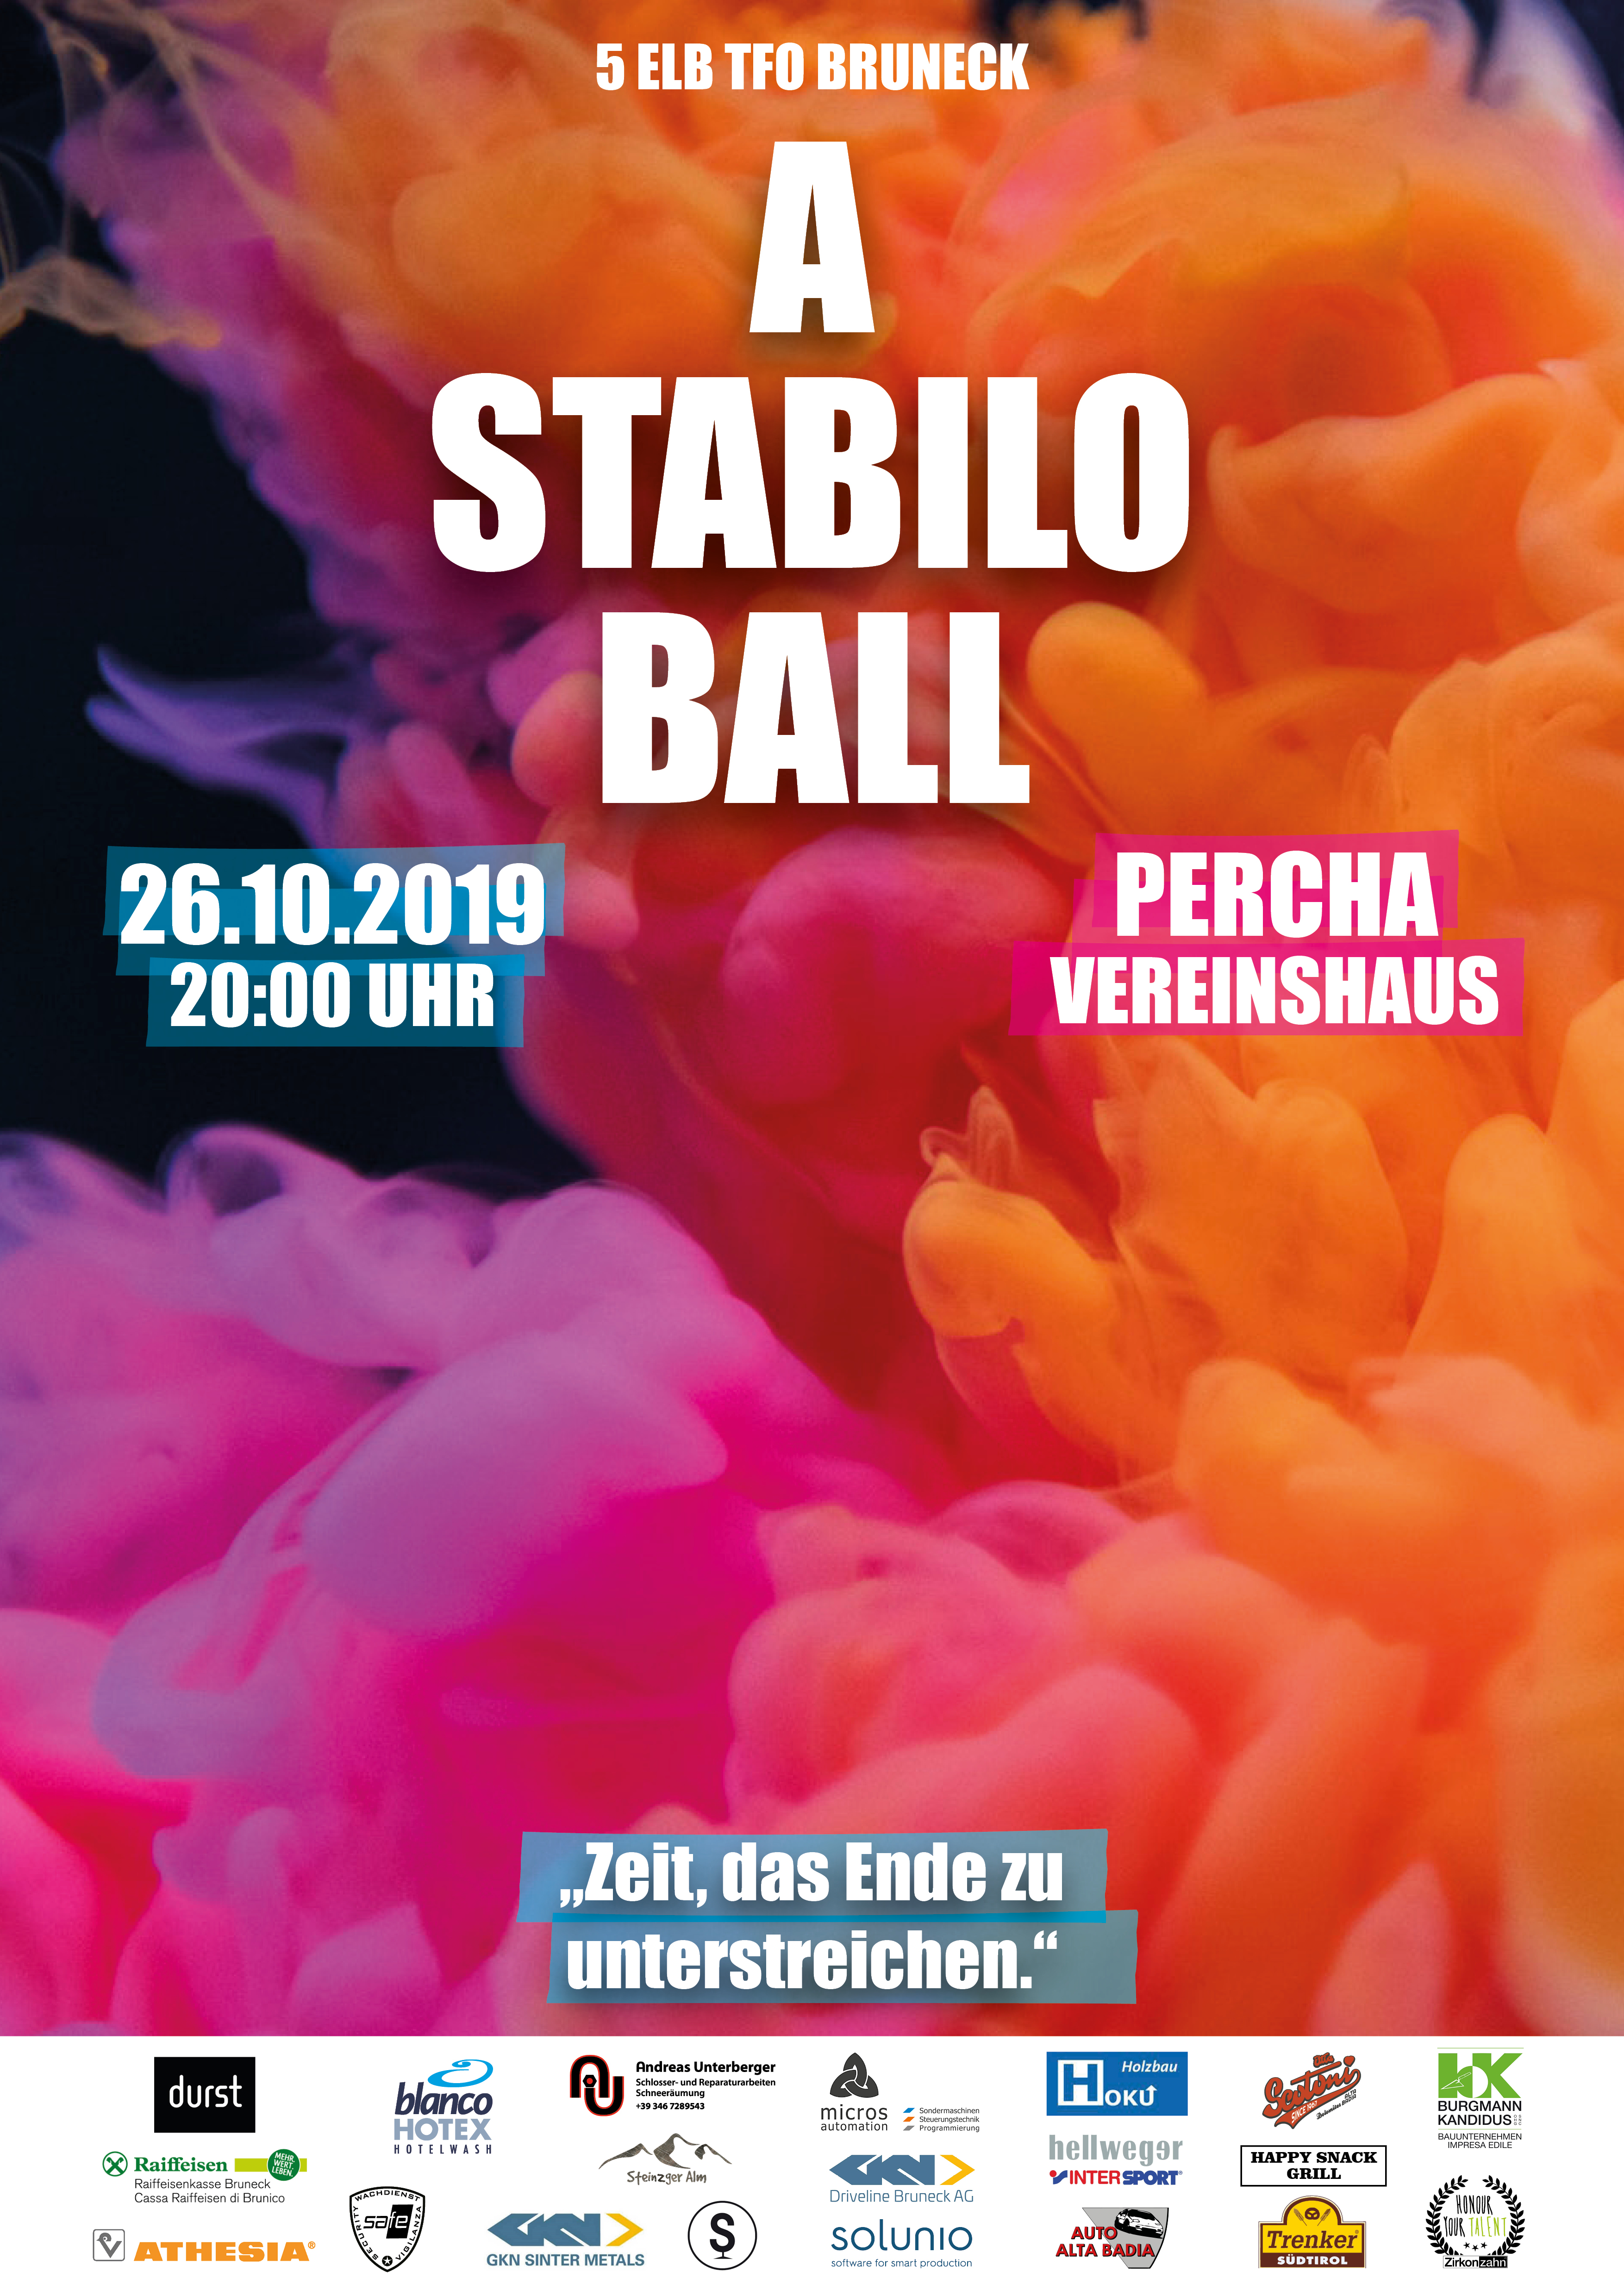 Stabilo Ball Plakat ohne Marker